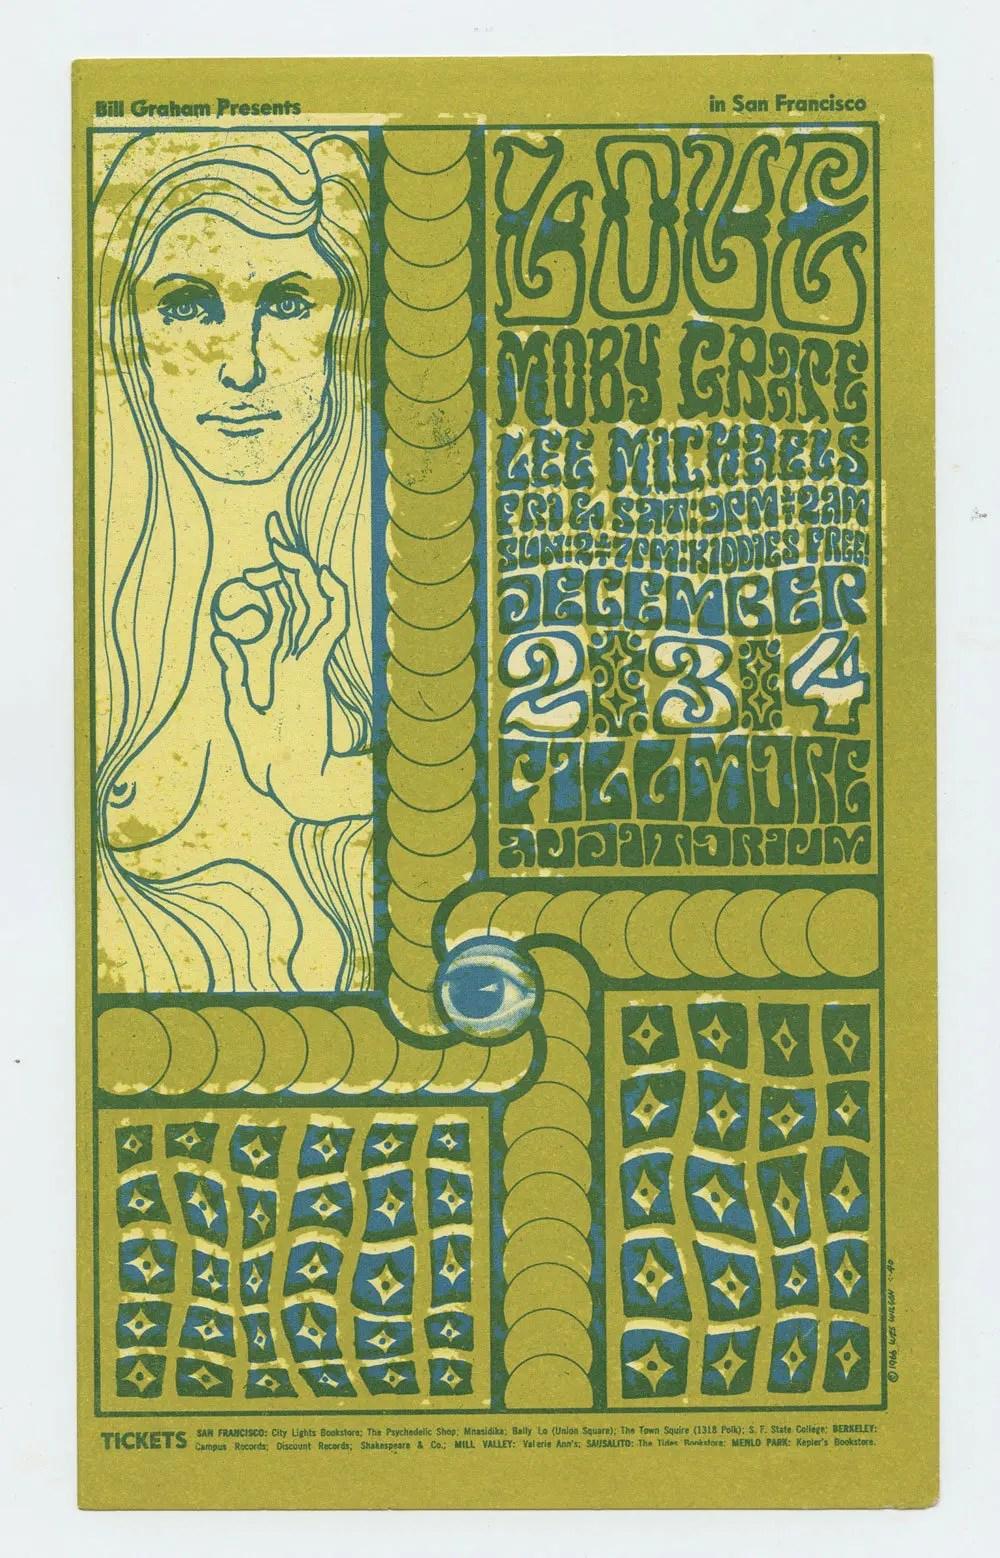 BG 40 Handbill Moby Grape 1966 Dec 24